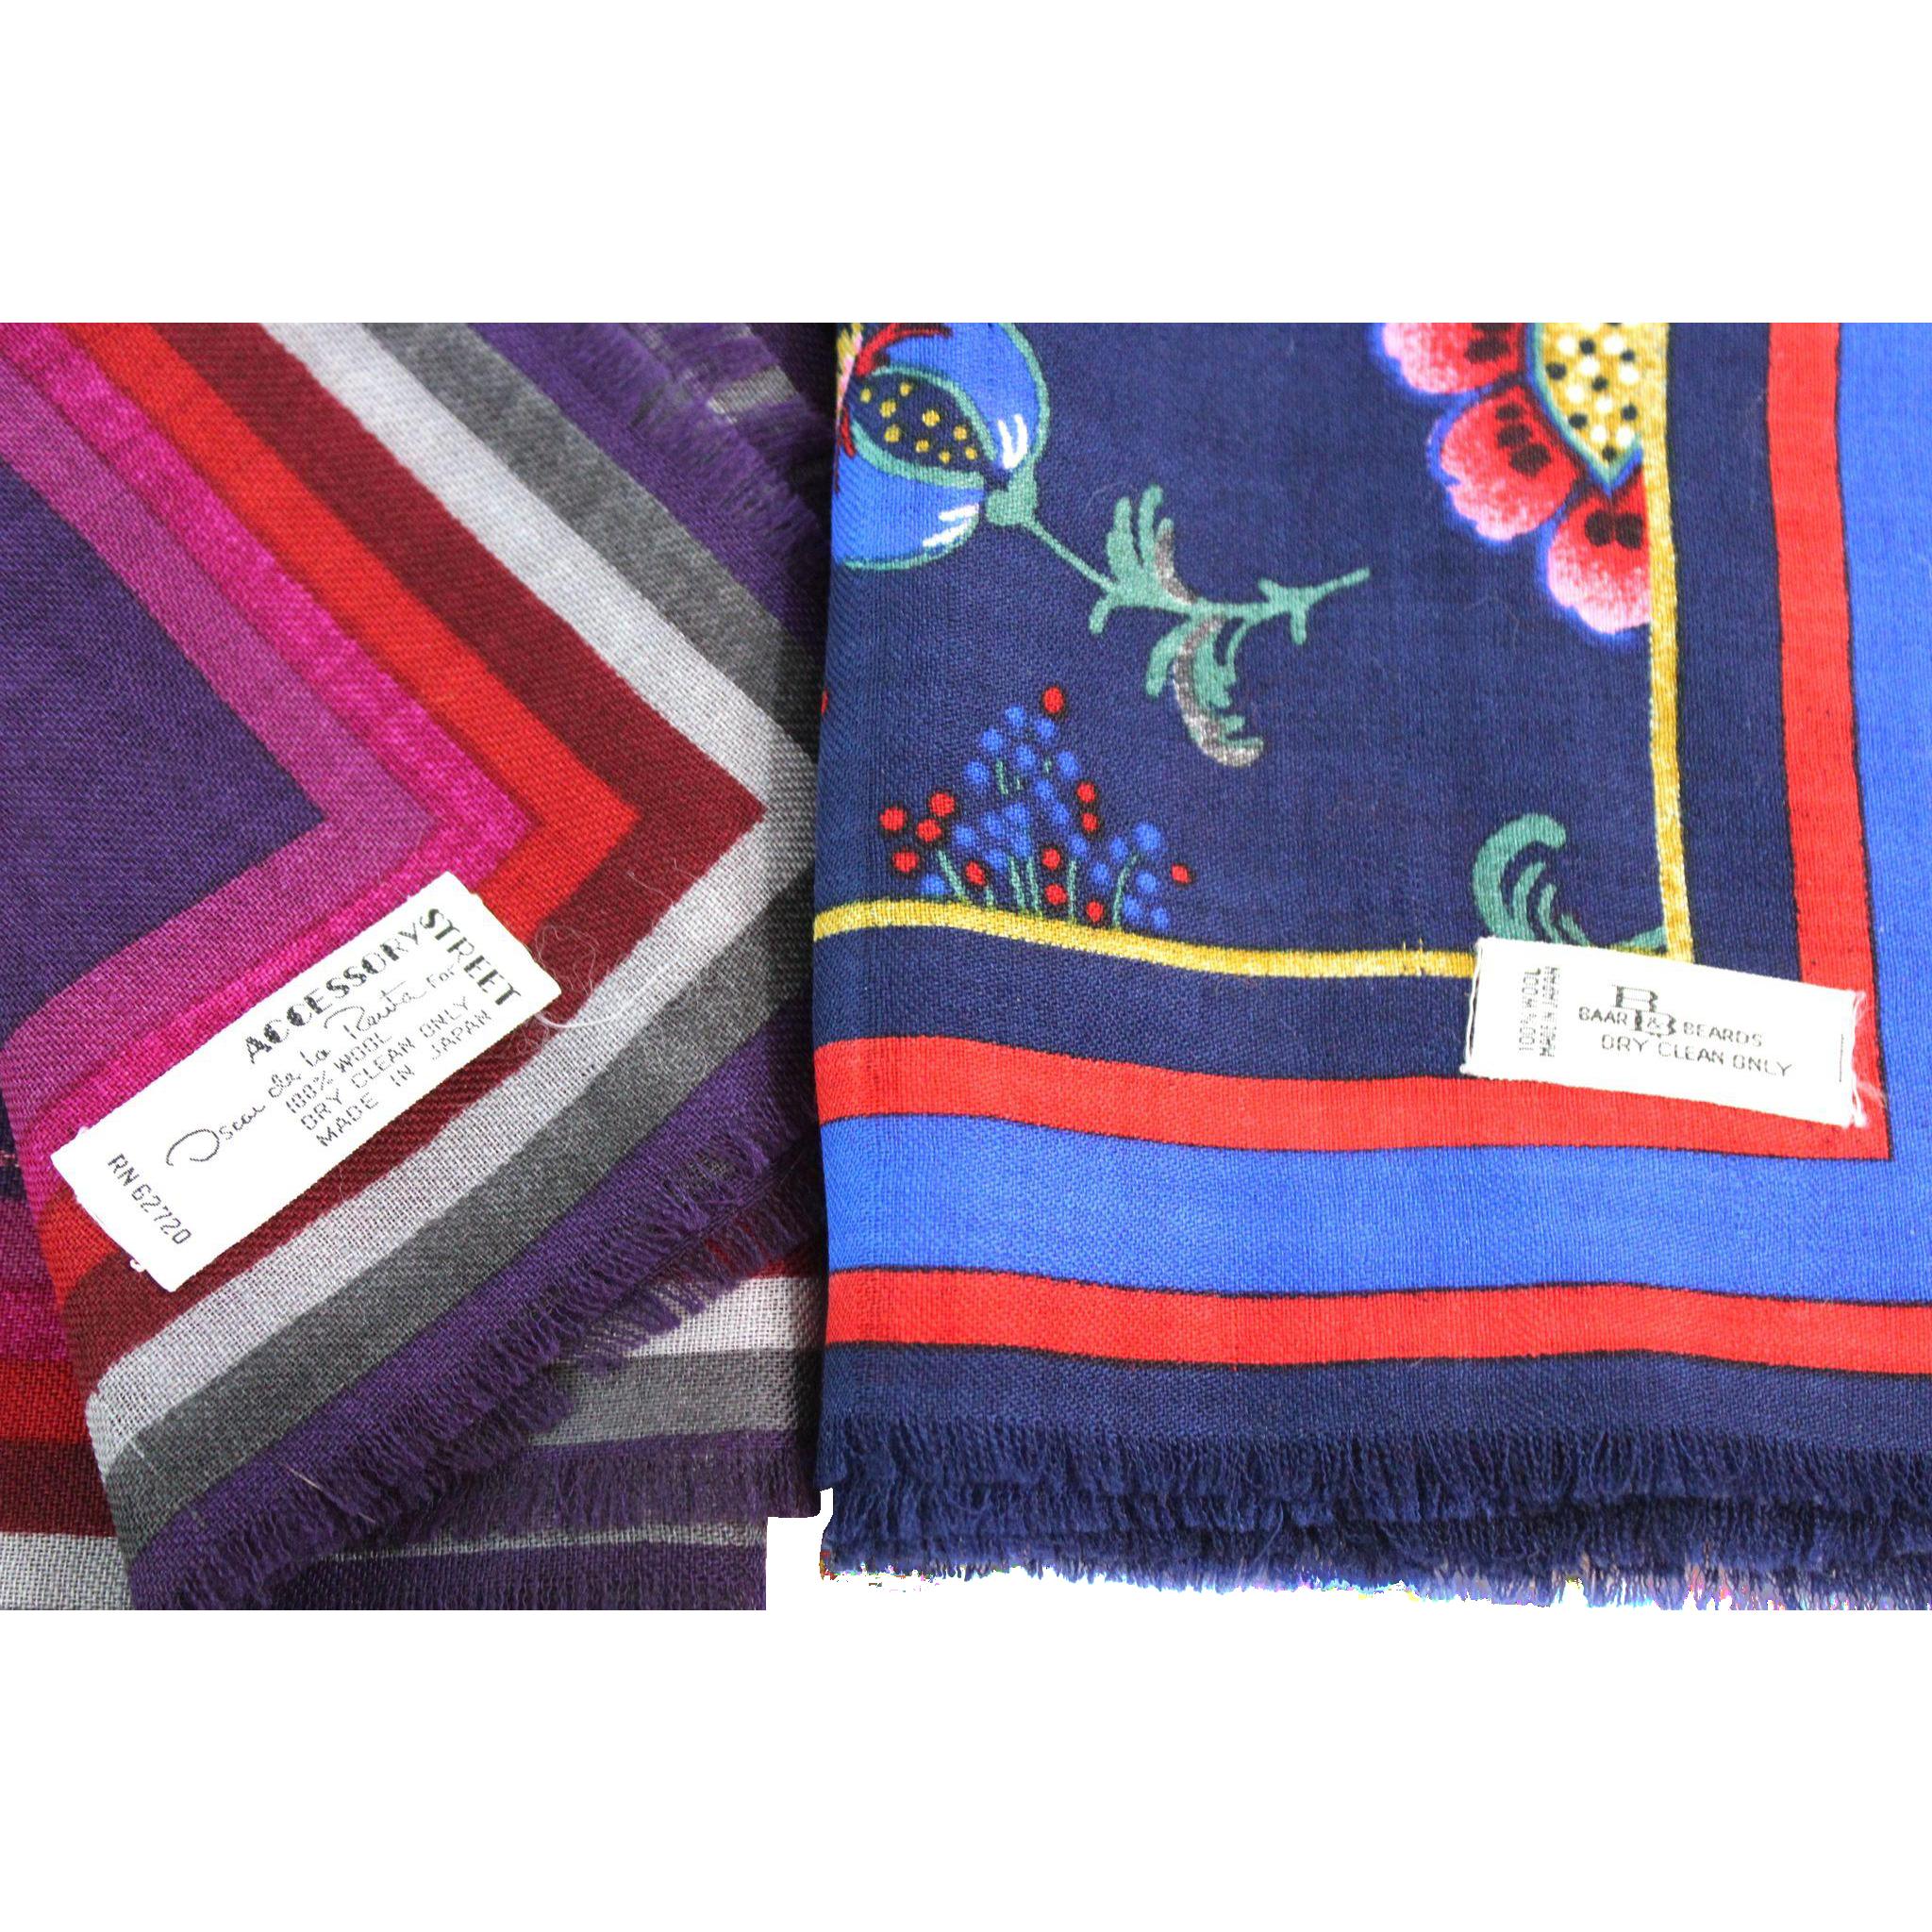 Two Designer Vintage Wool Scarves